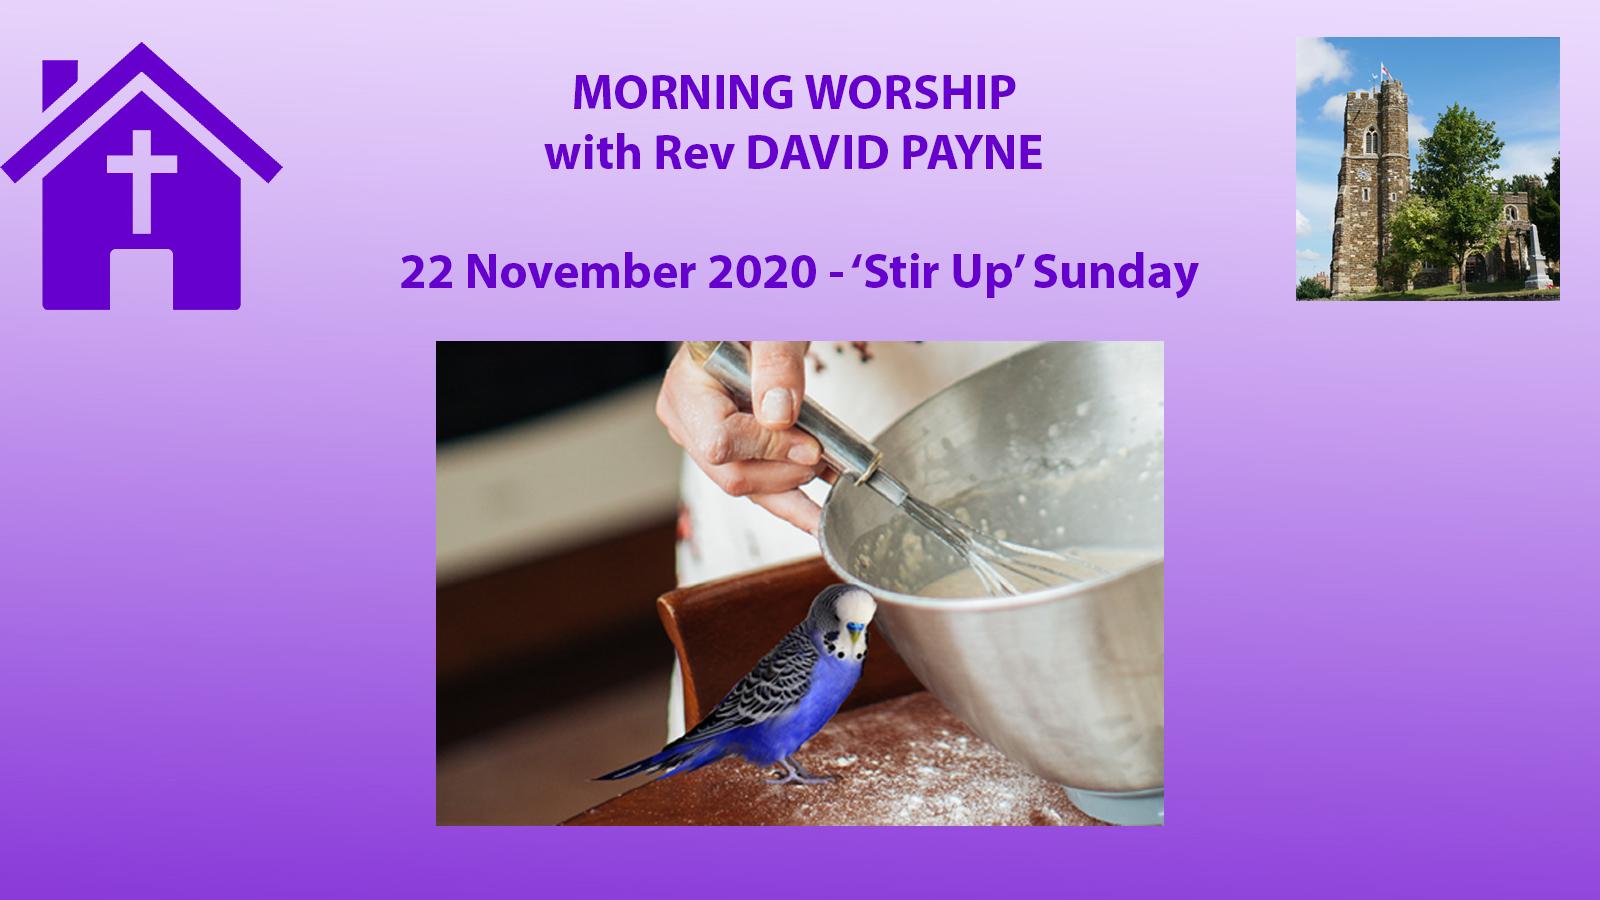 Sunday 22 Nov - Stir Up SUnday